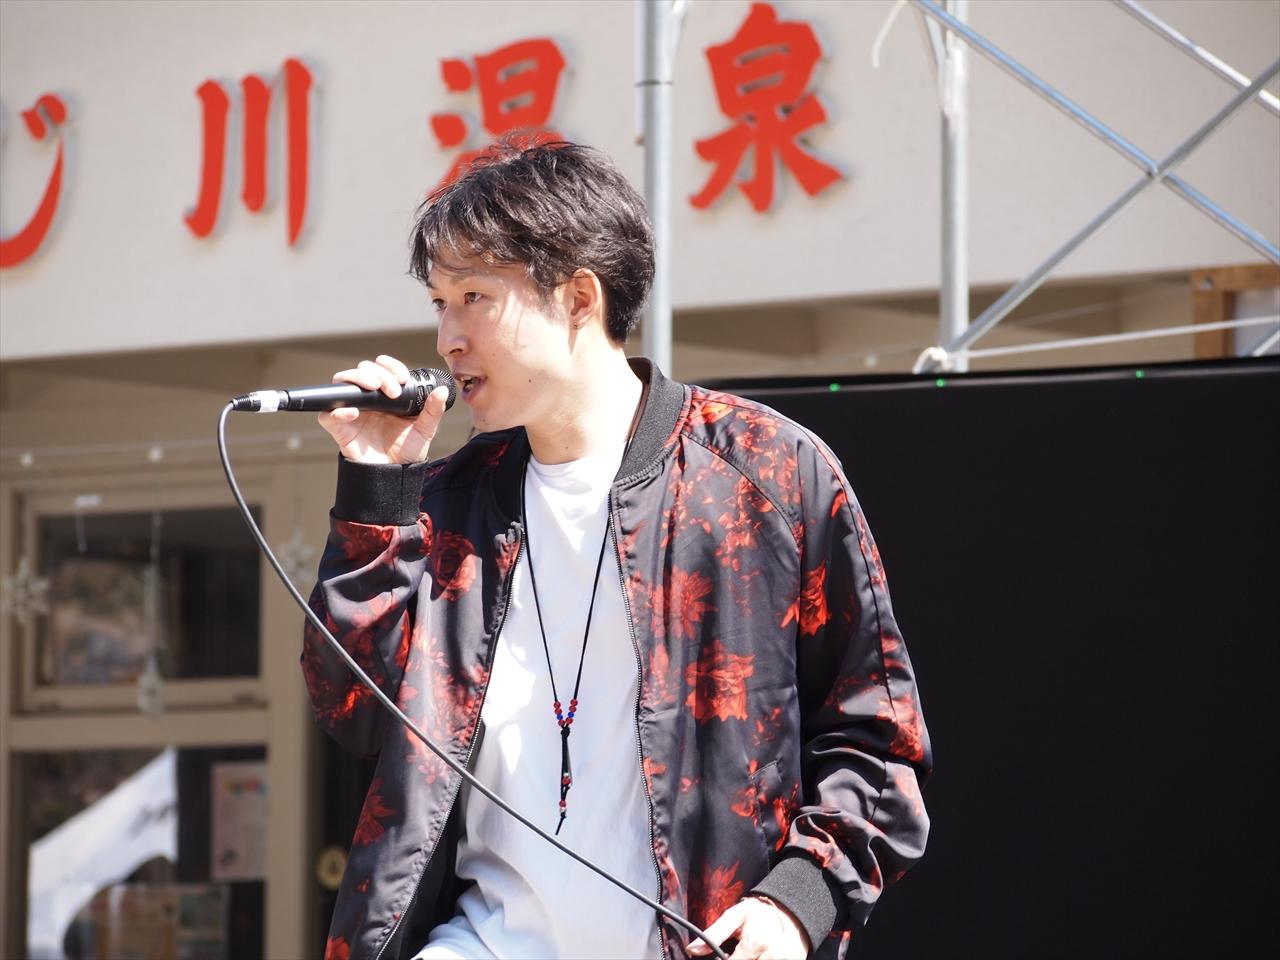 Elef The Rius(エリフザリウス) Kyohei もみじ川温泉 さくら祭り エキサイティングサマーinワジキ 2019 オーディション